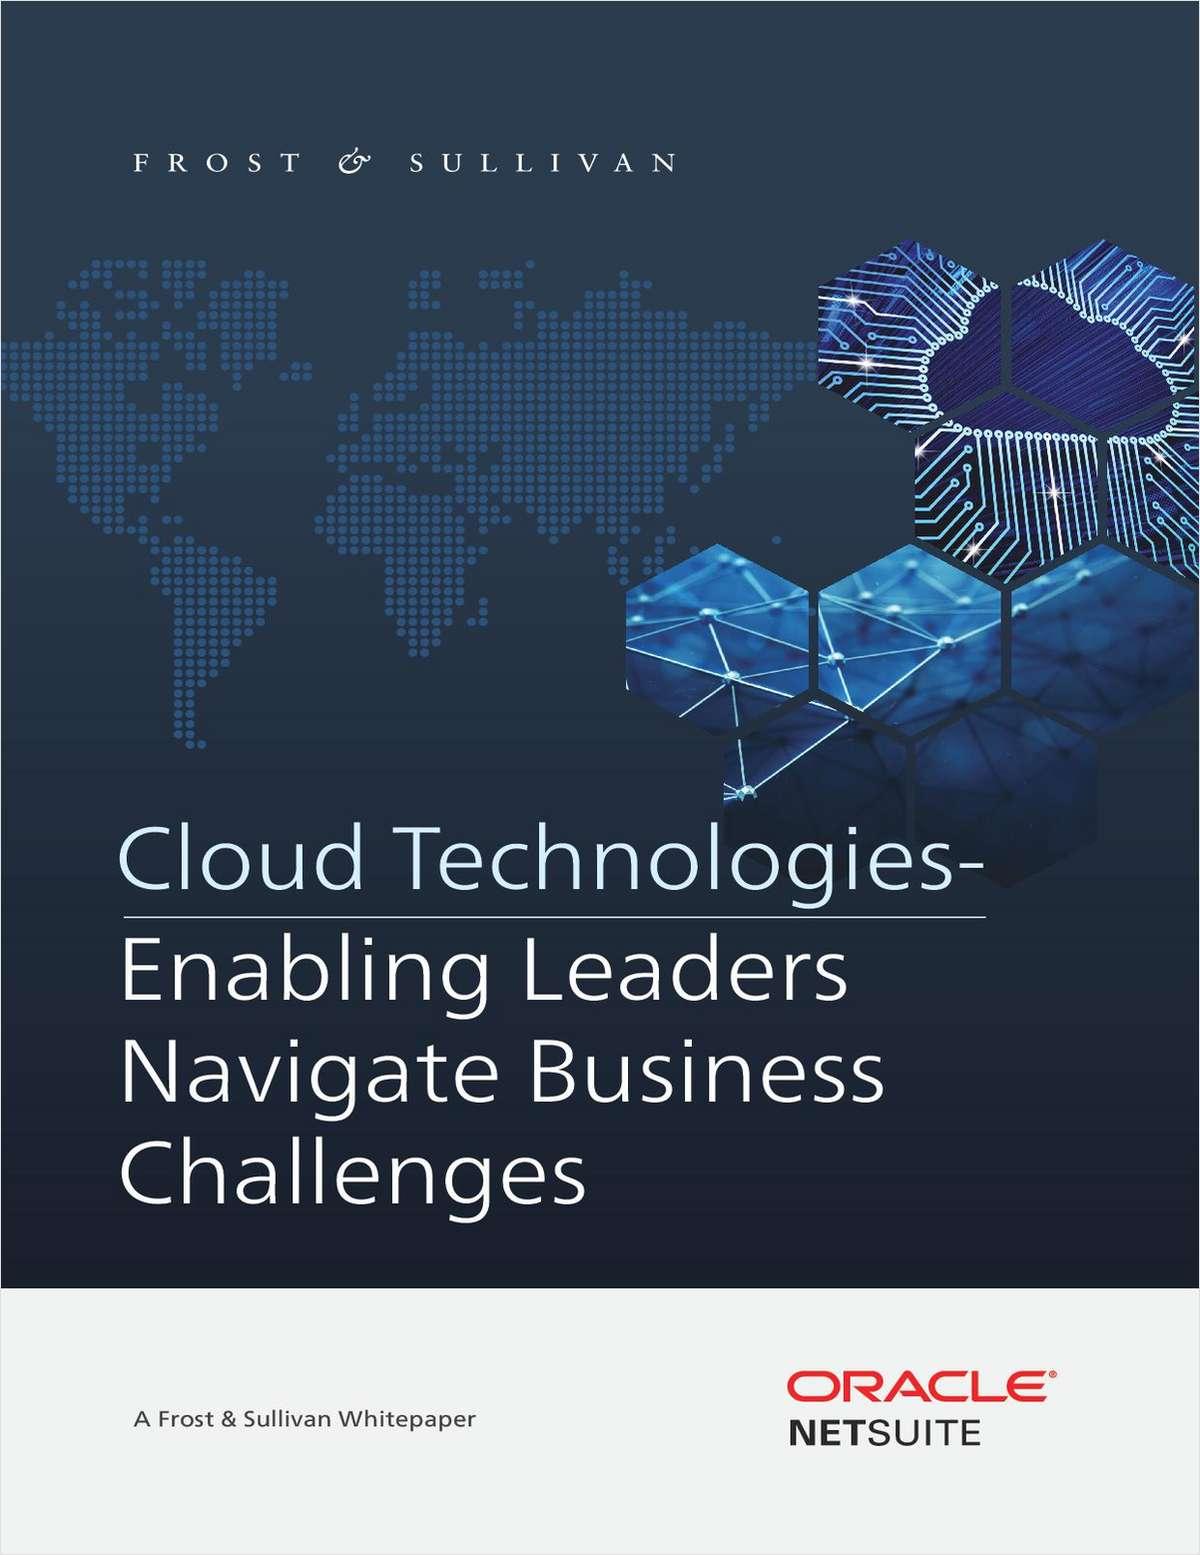 Cloud Technologies - Enabling Leaders Navigate Business Challenges